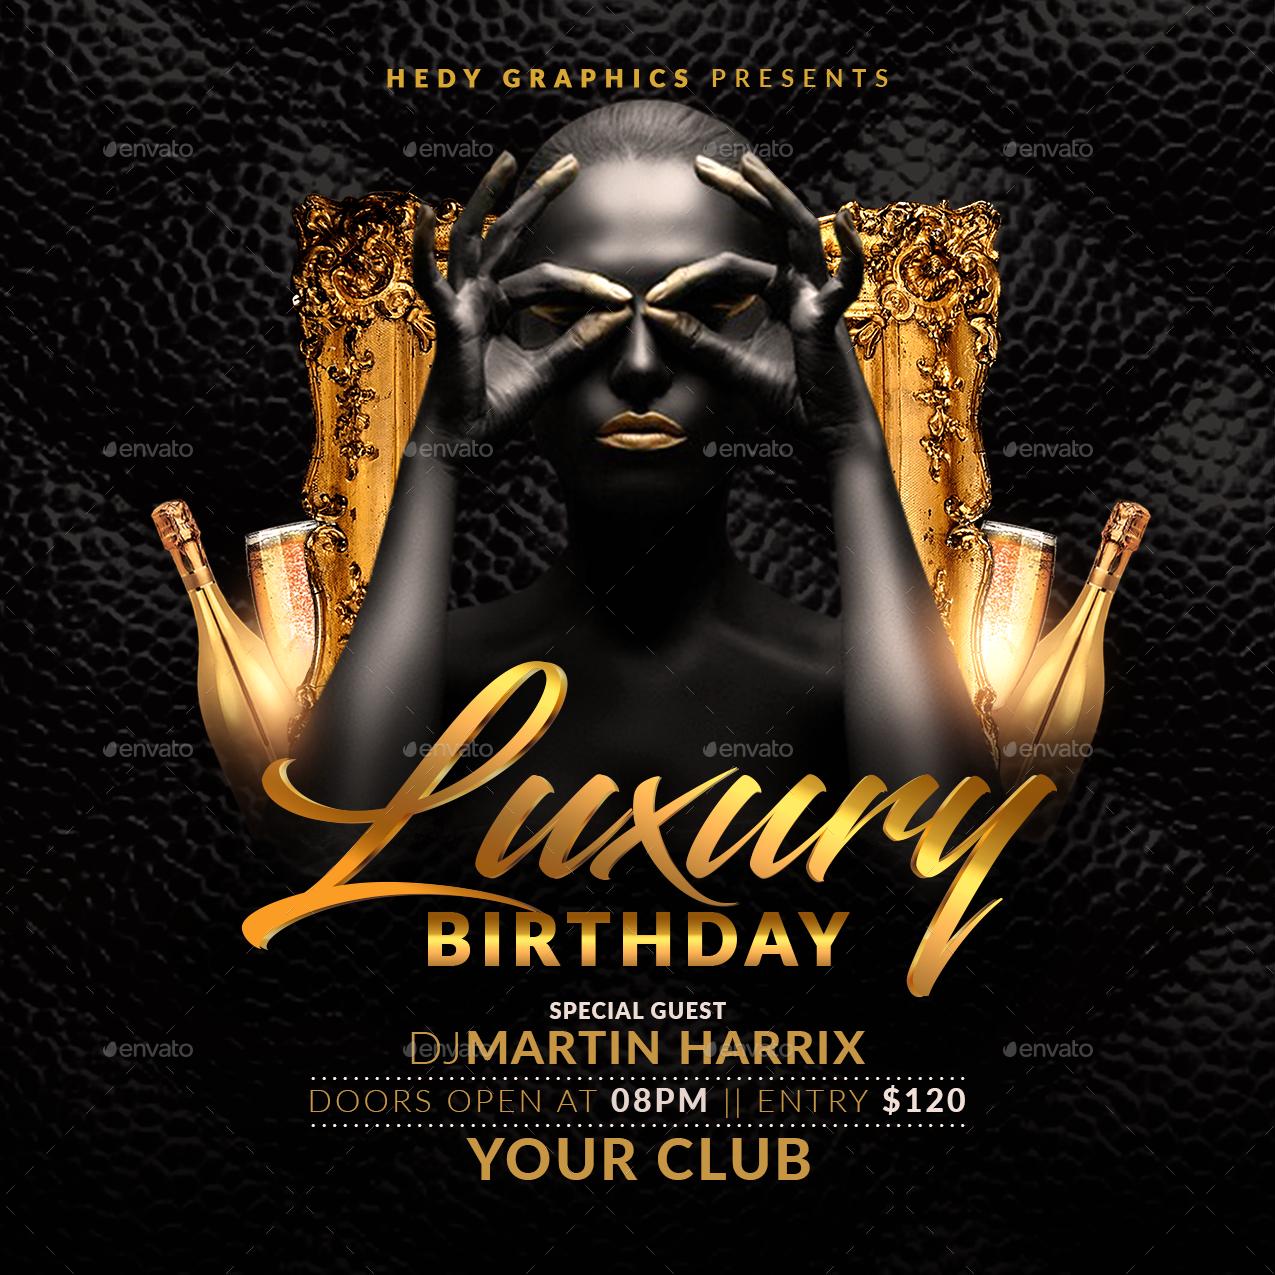 birthday bash flyer by hedygraphics